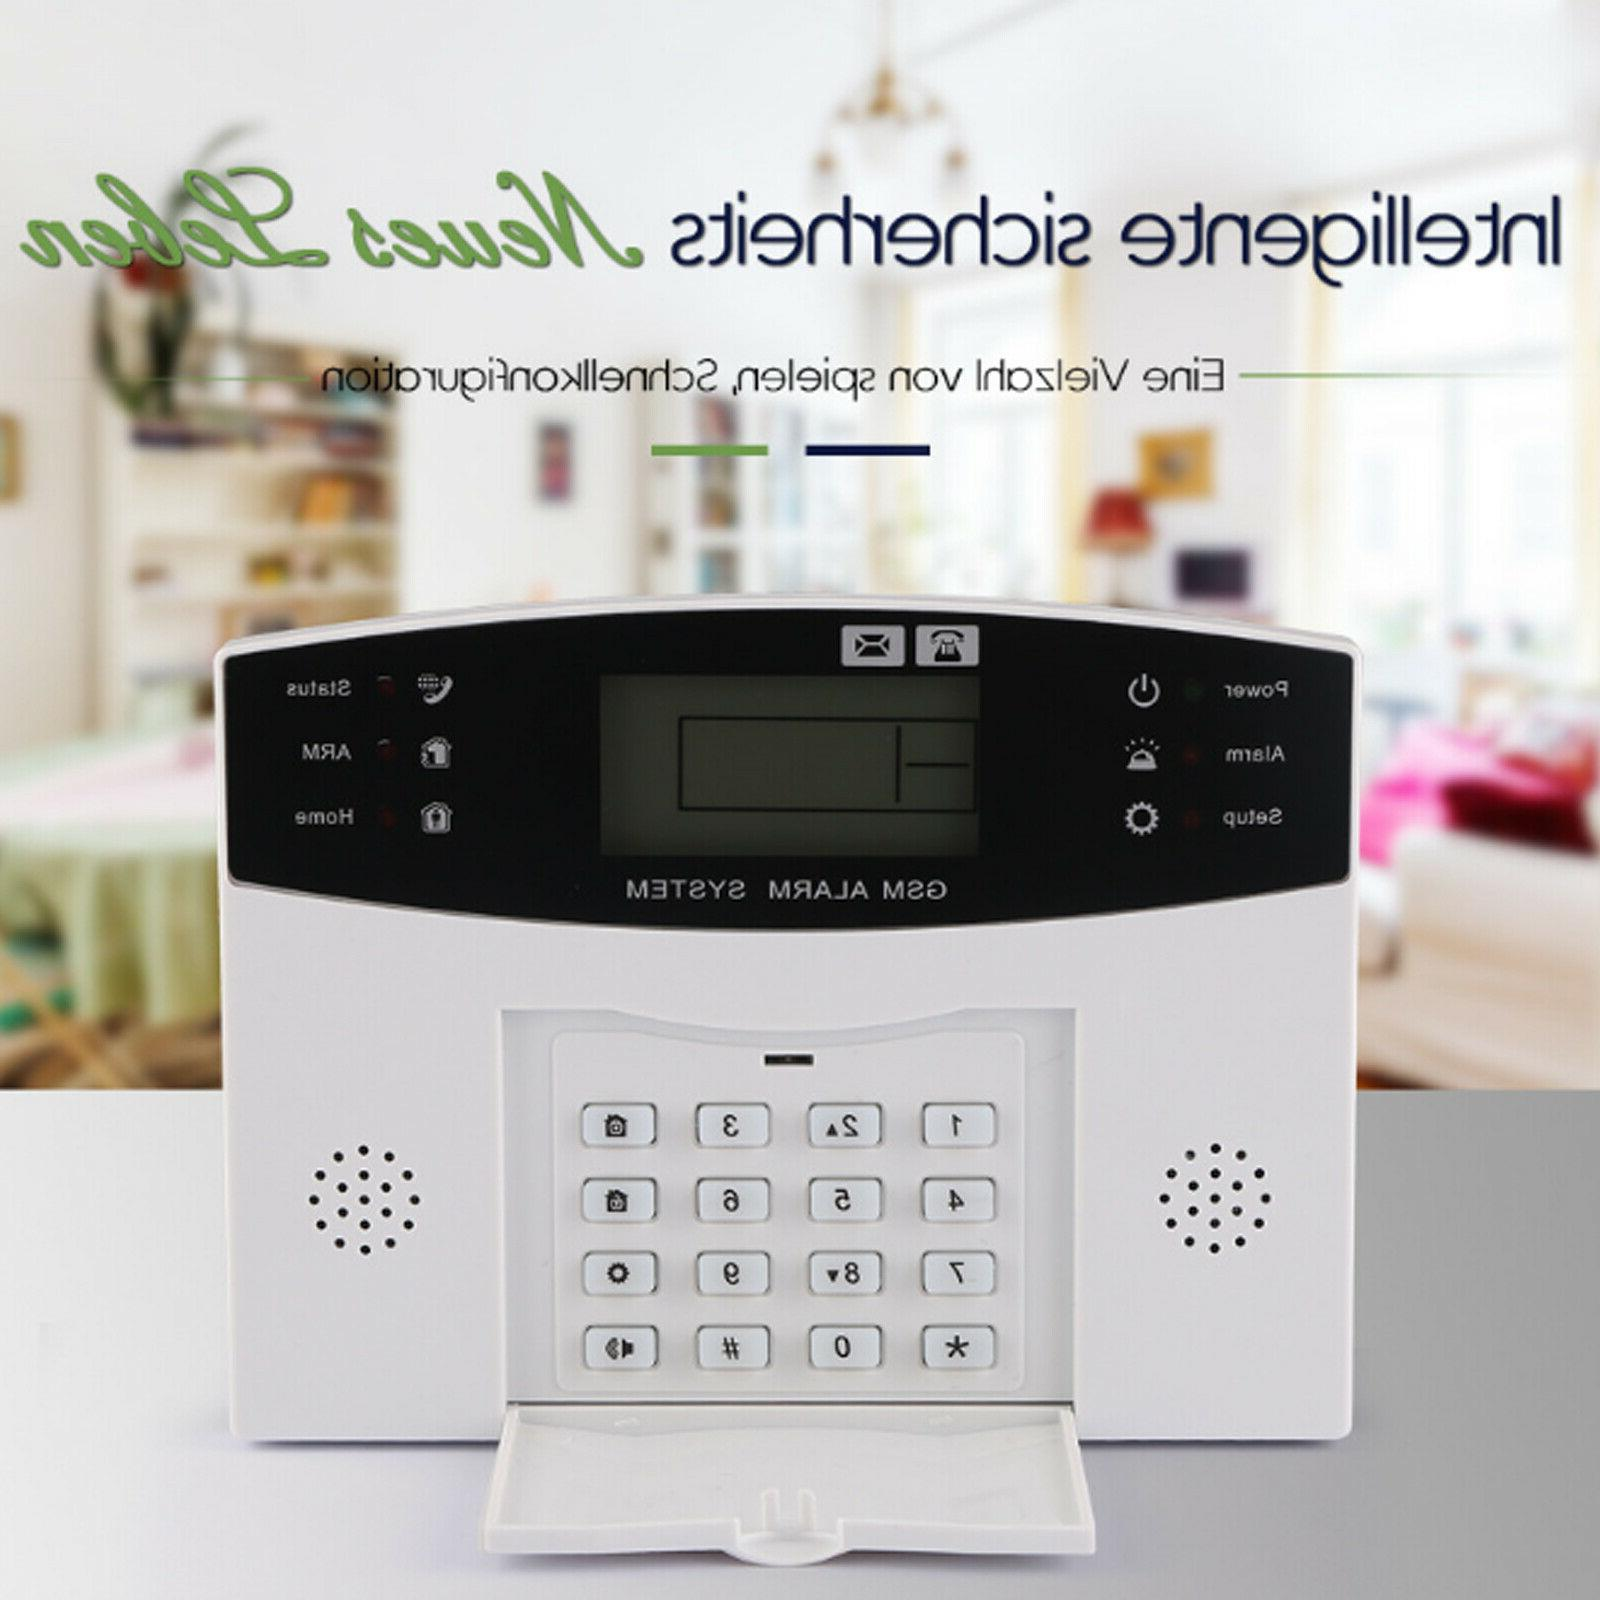 Wireless Wired EK GSM SMS House Alarm Security Burglar Sensors